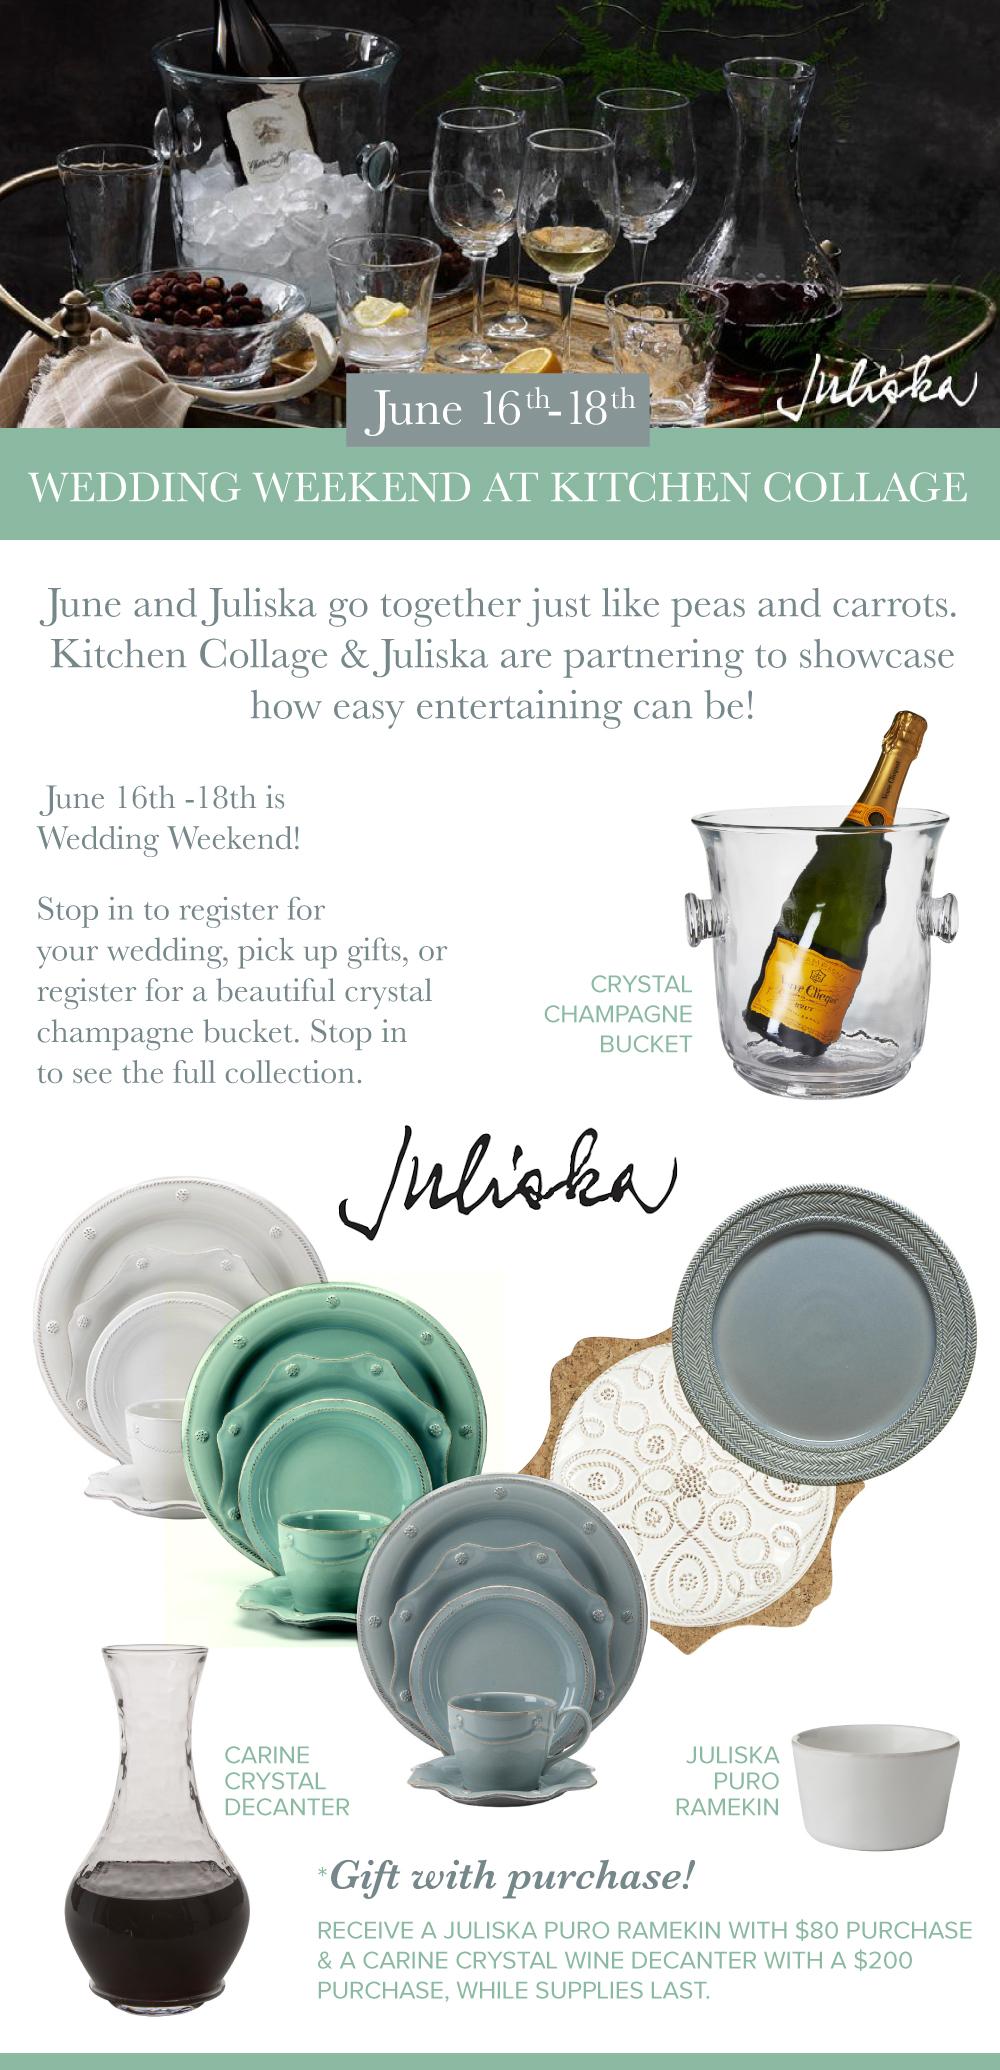 Juliska Showcase and Wedding Weekend